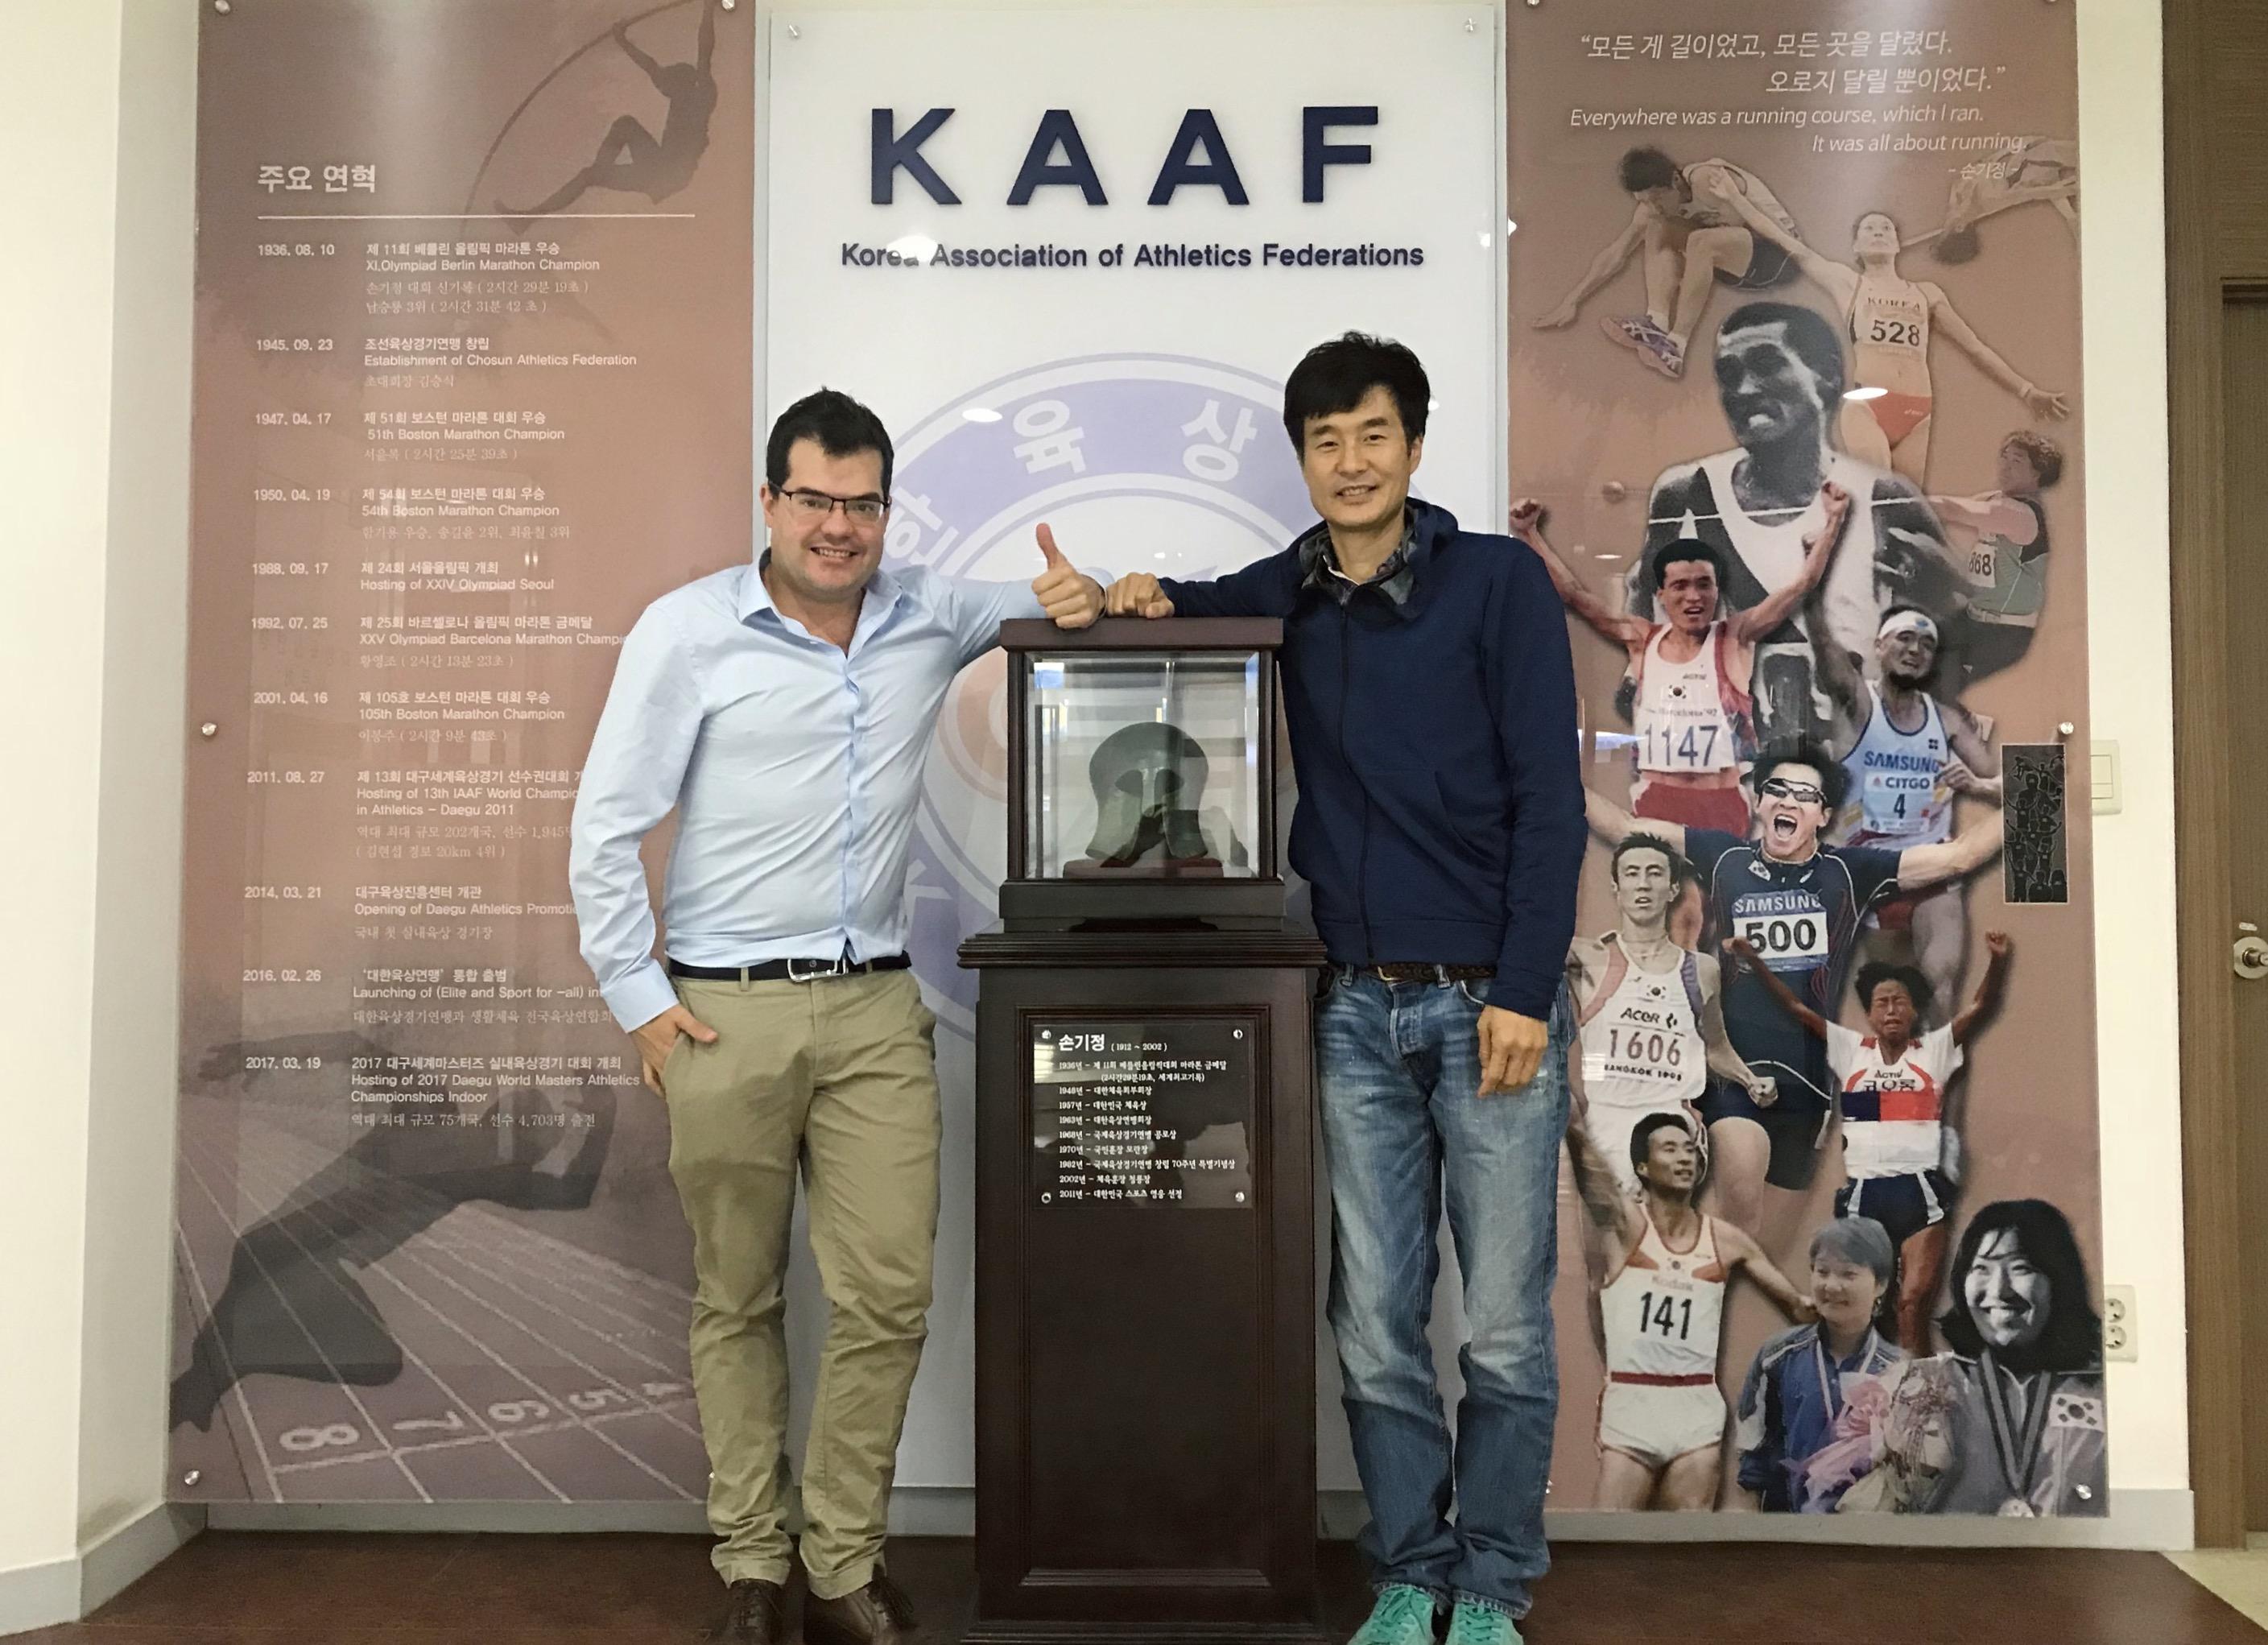 Korea-association-athletic-federations